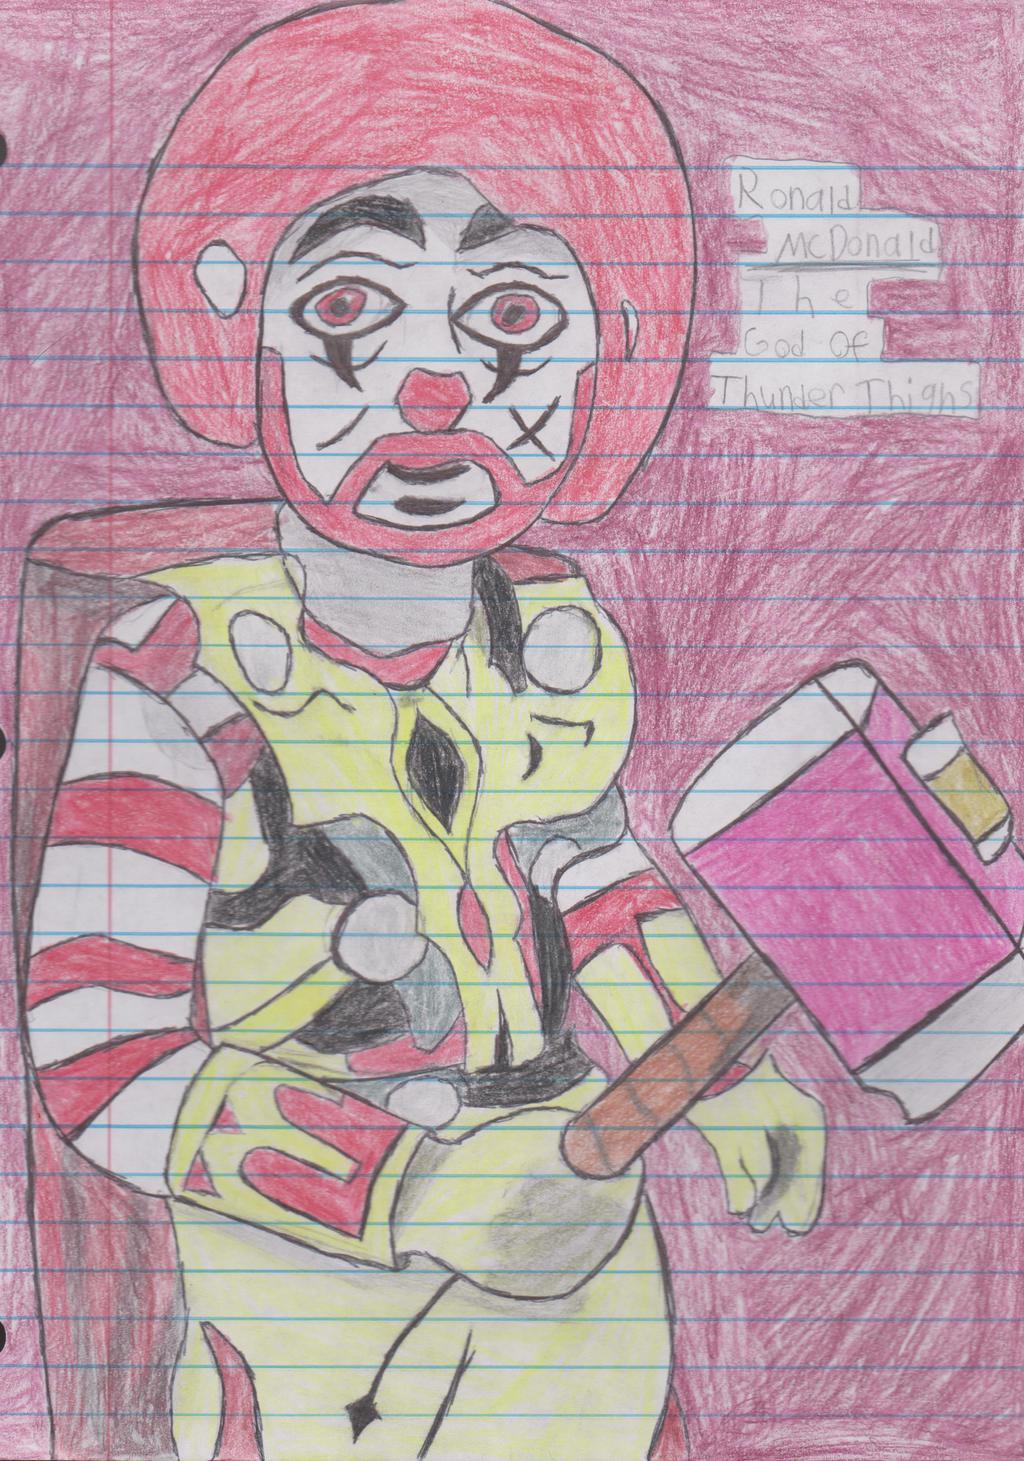 The God of Thunder Thighs: Ronald McDonald